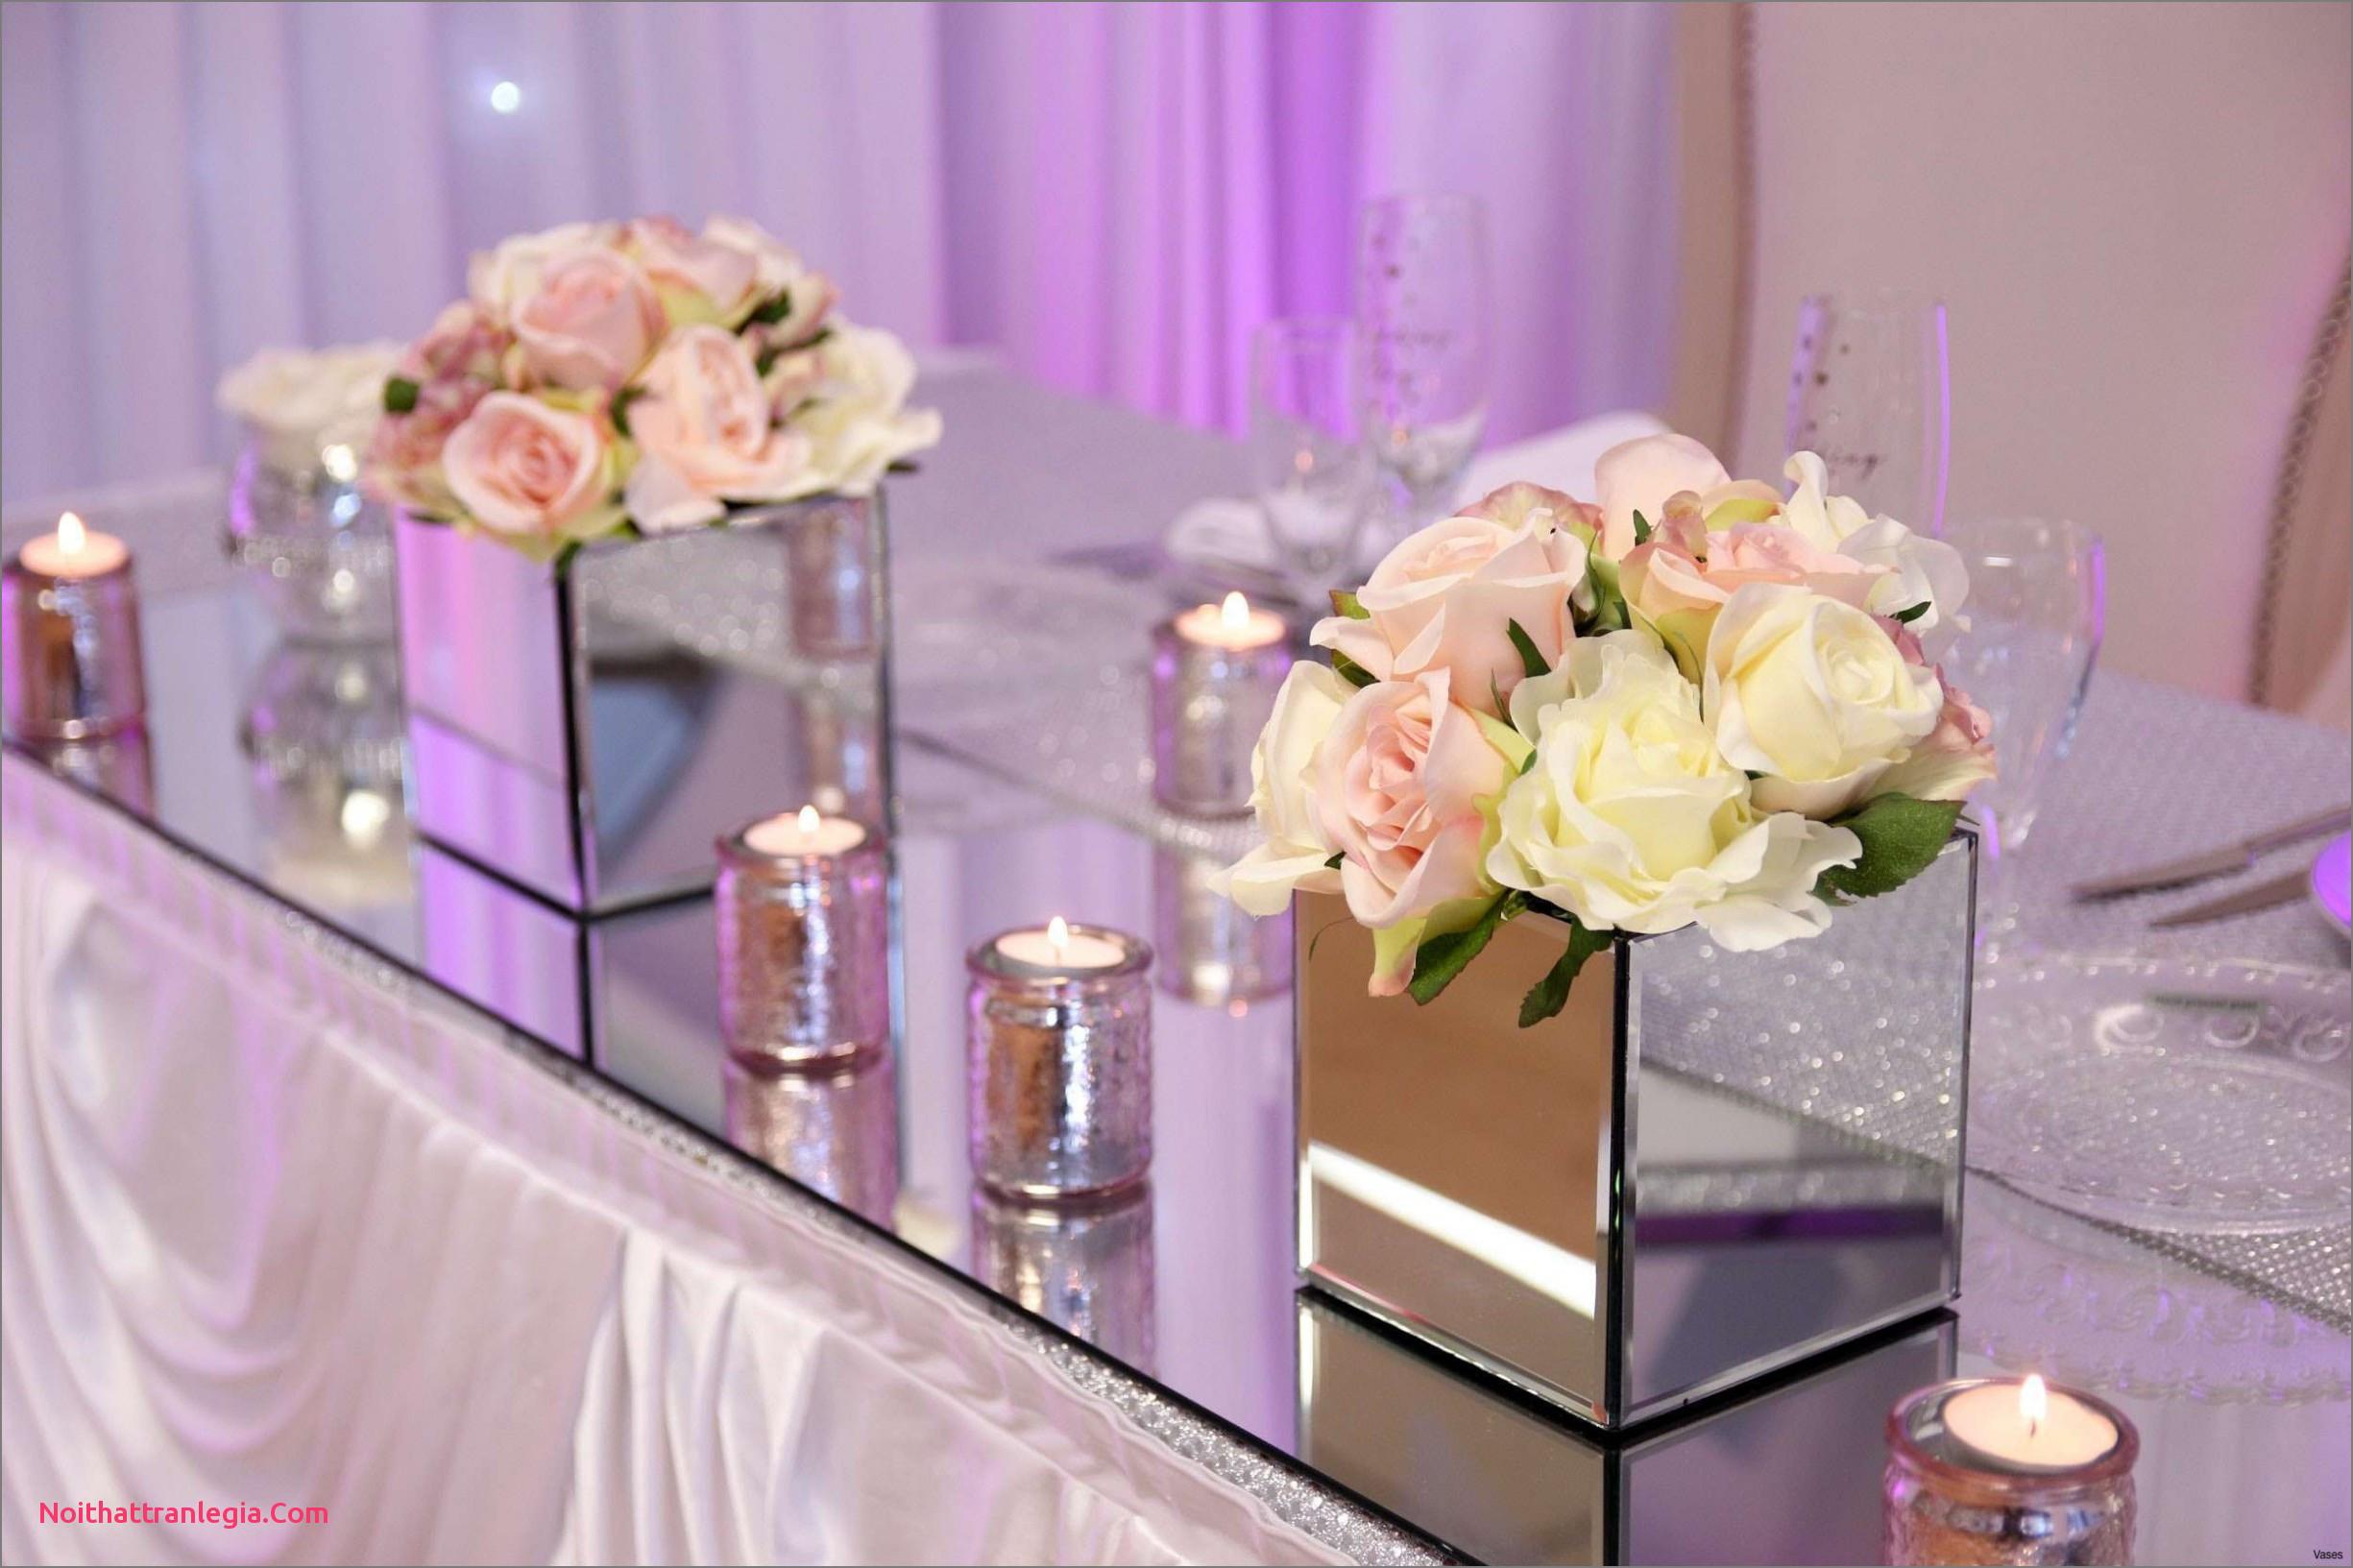 gold vases wedding of 20 wedding vases noithattranlegia vases design with mirrored square vase 3h vases mirror table decorationi 0d weddings